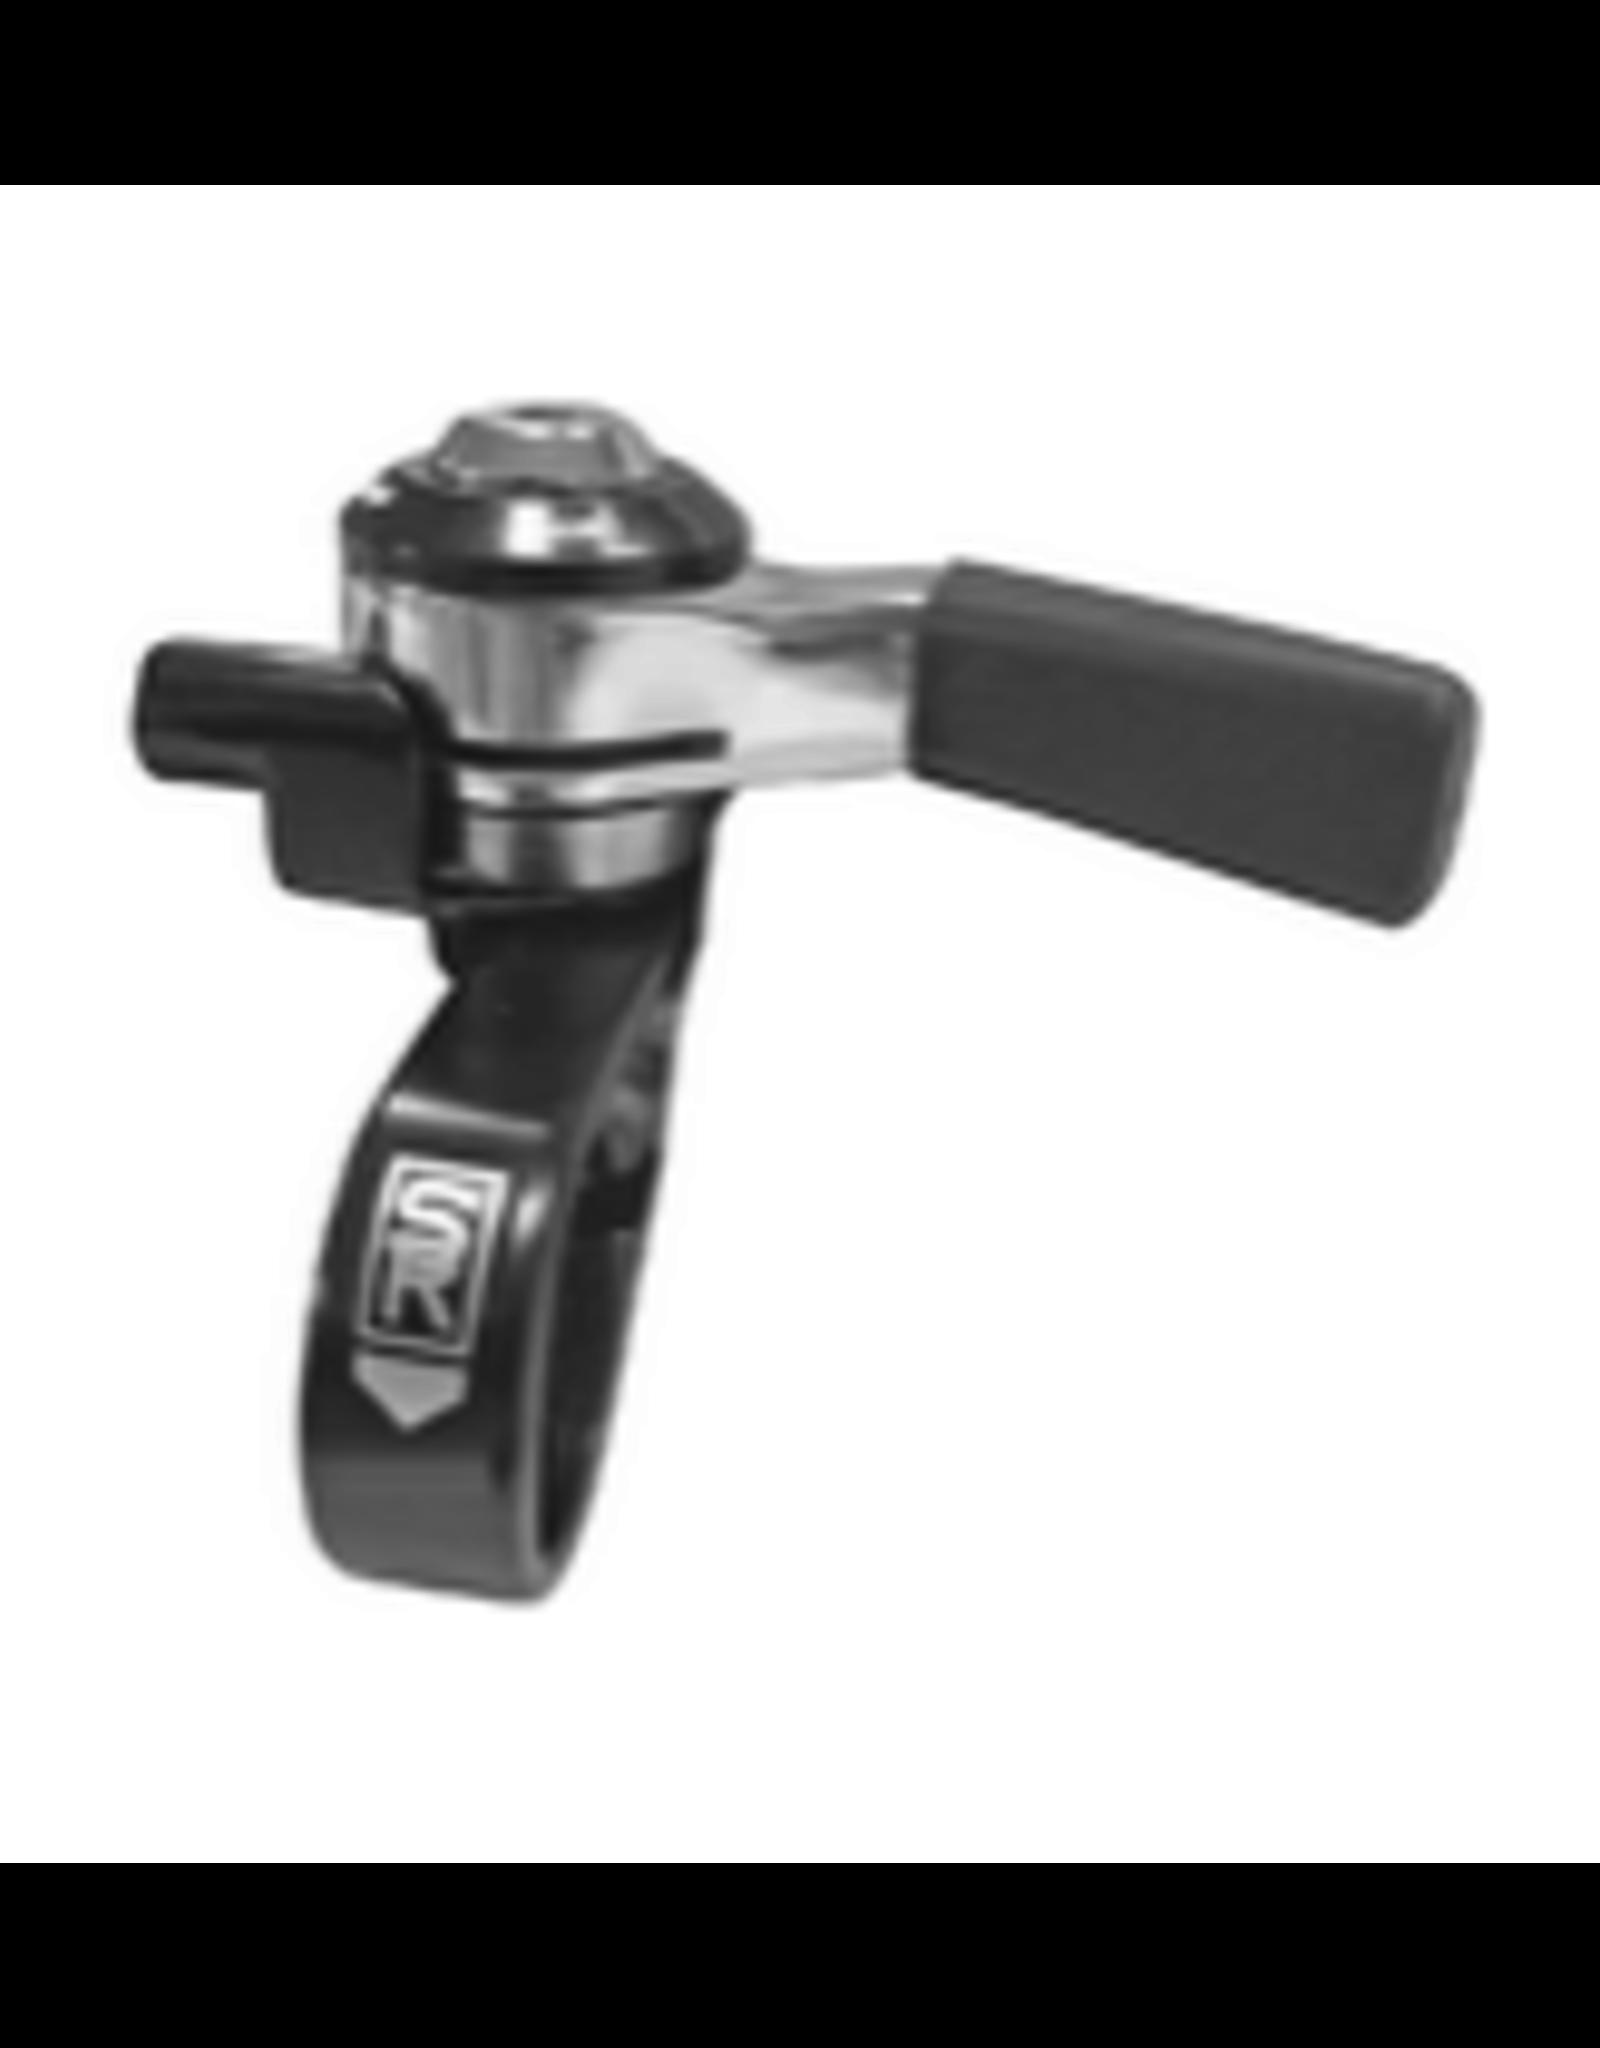 Sunrace Sunrace SLM96 Thumb Shifter Single